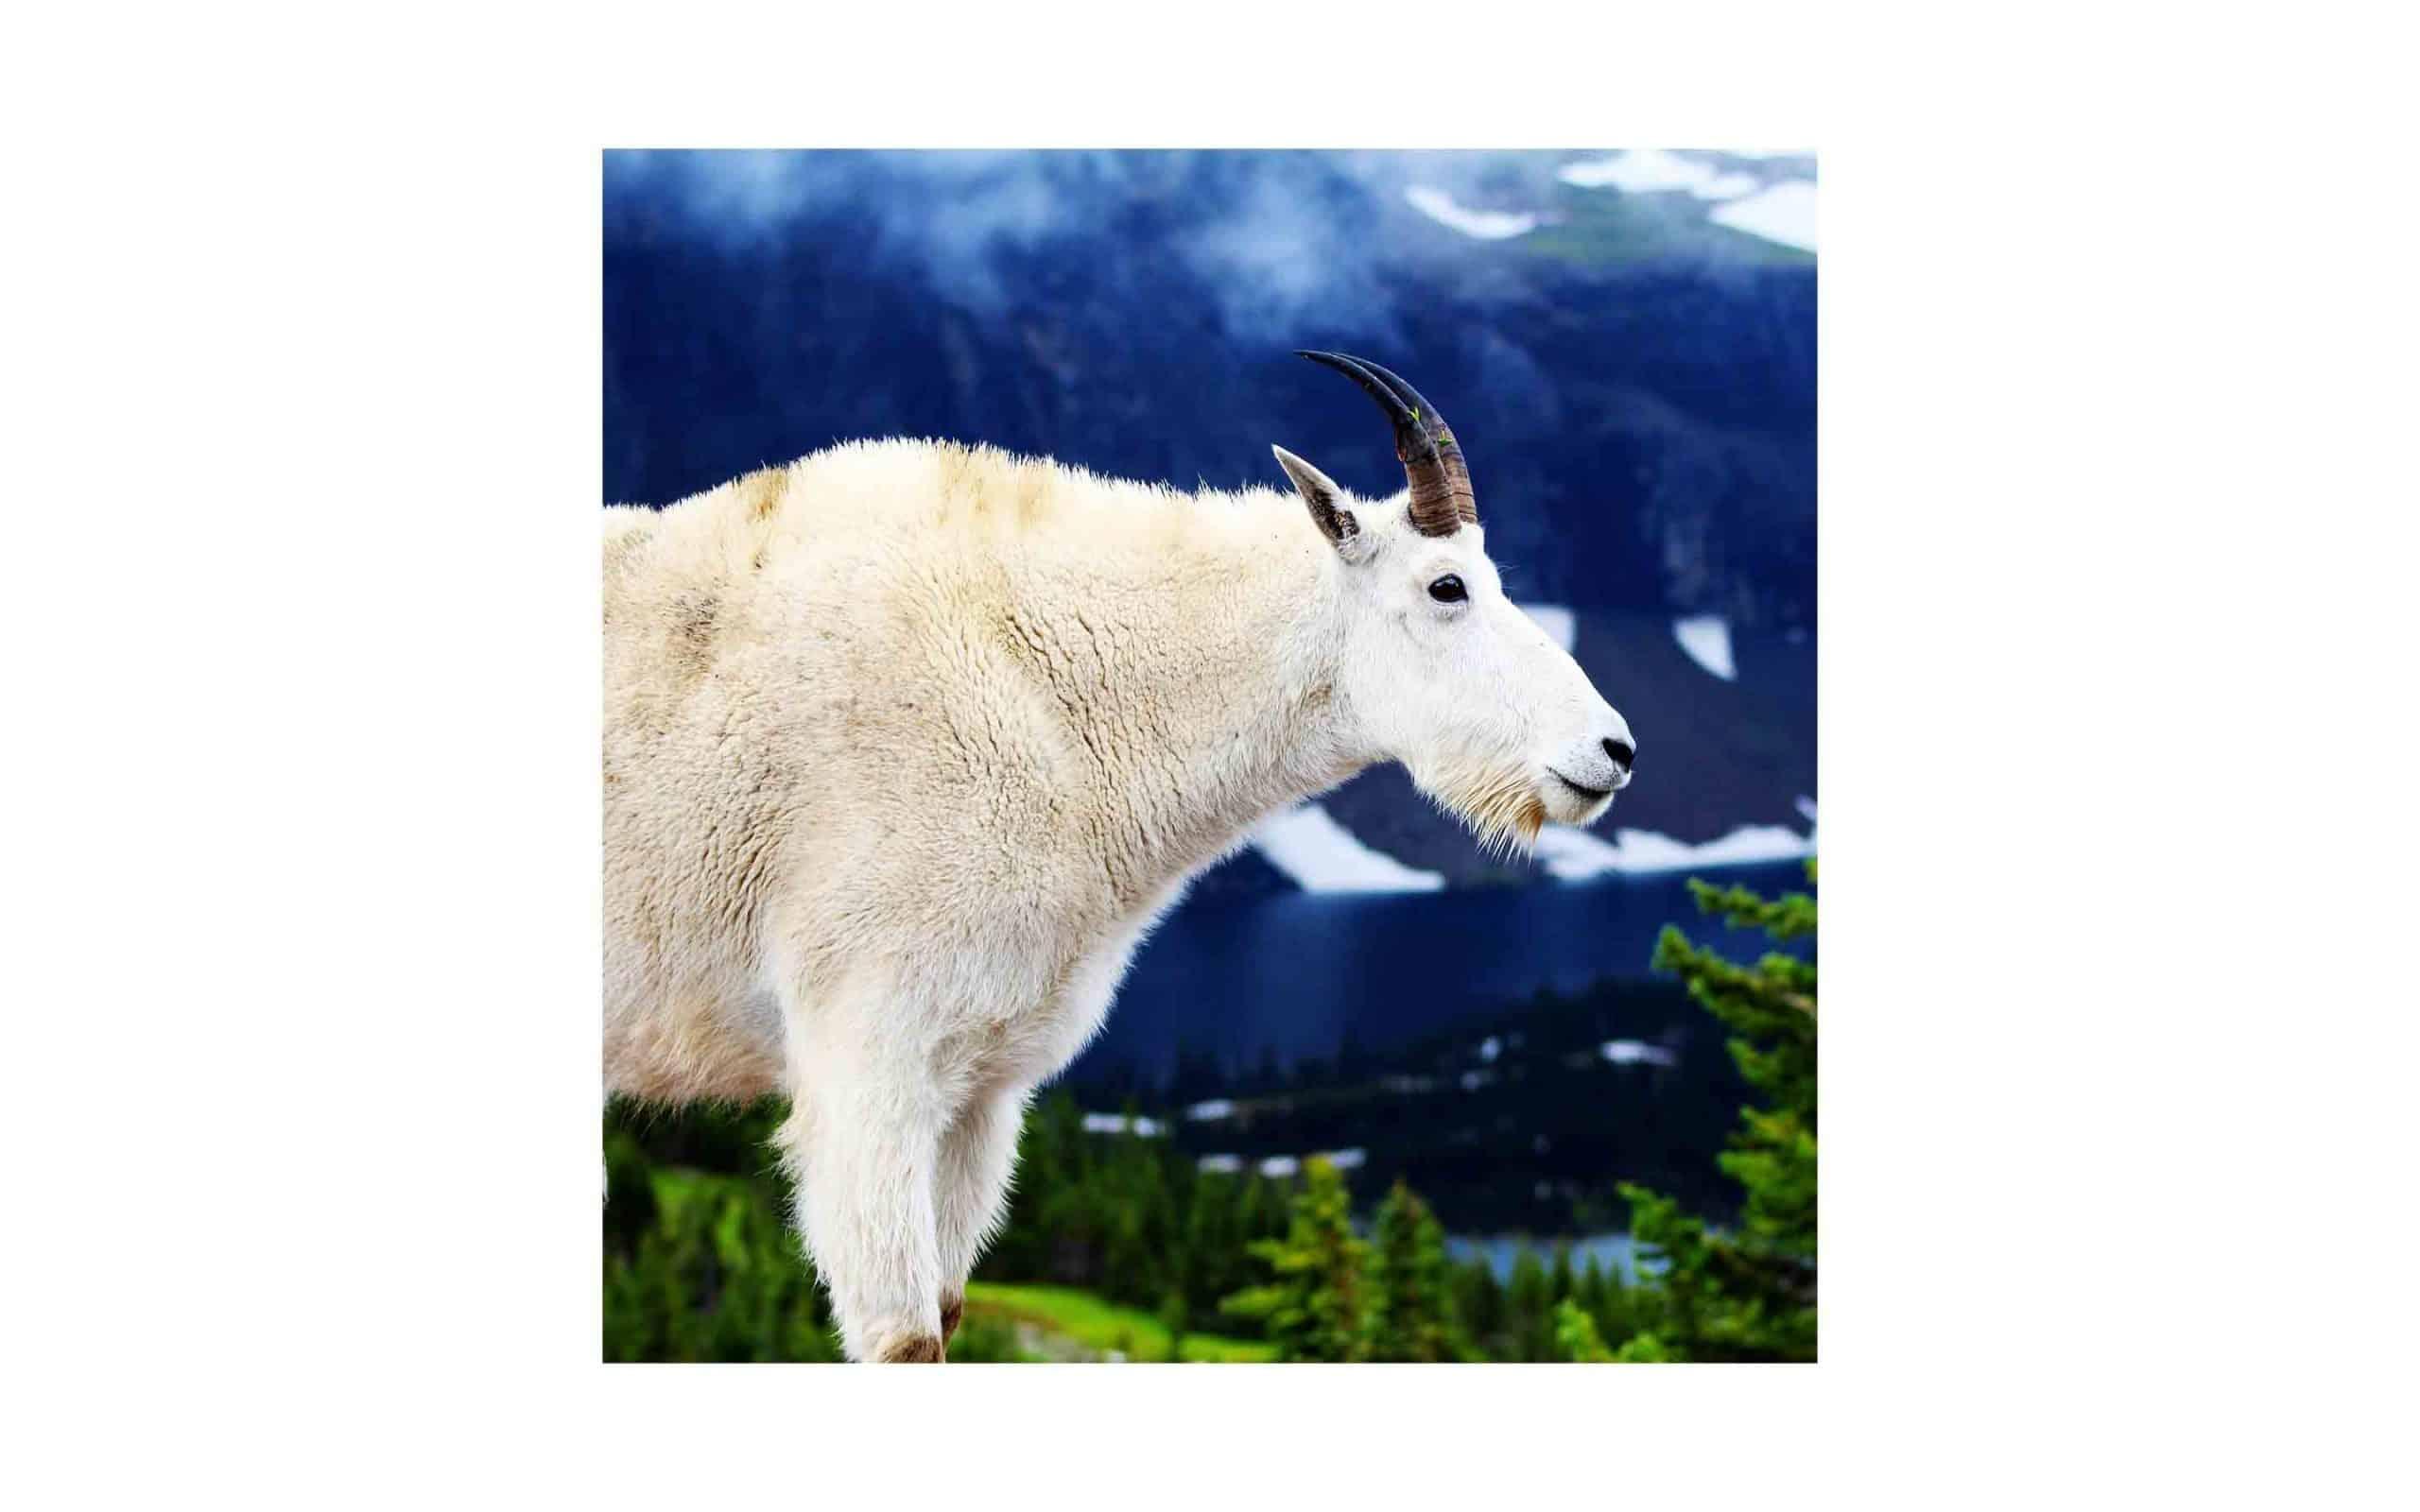 nv-mountain-goat-Rex-Wolferman.jpg?mtime=20170811134641#asset:6284